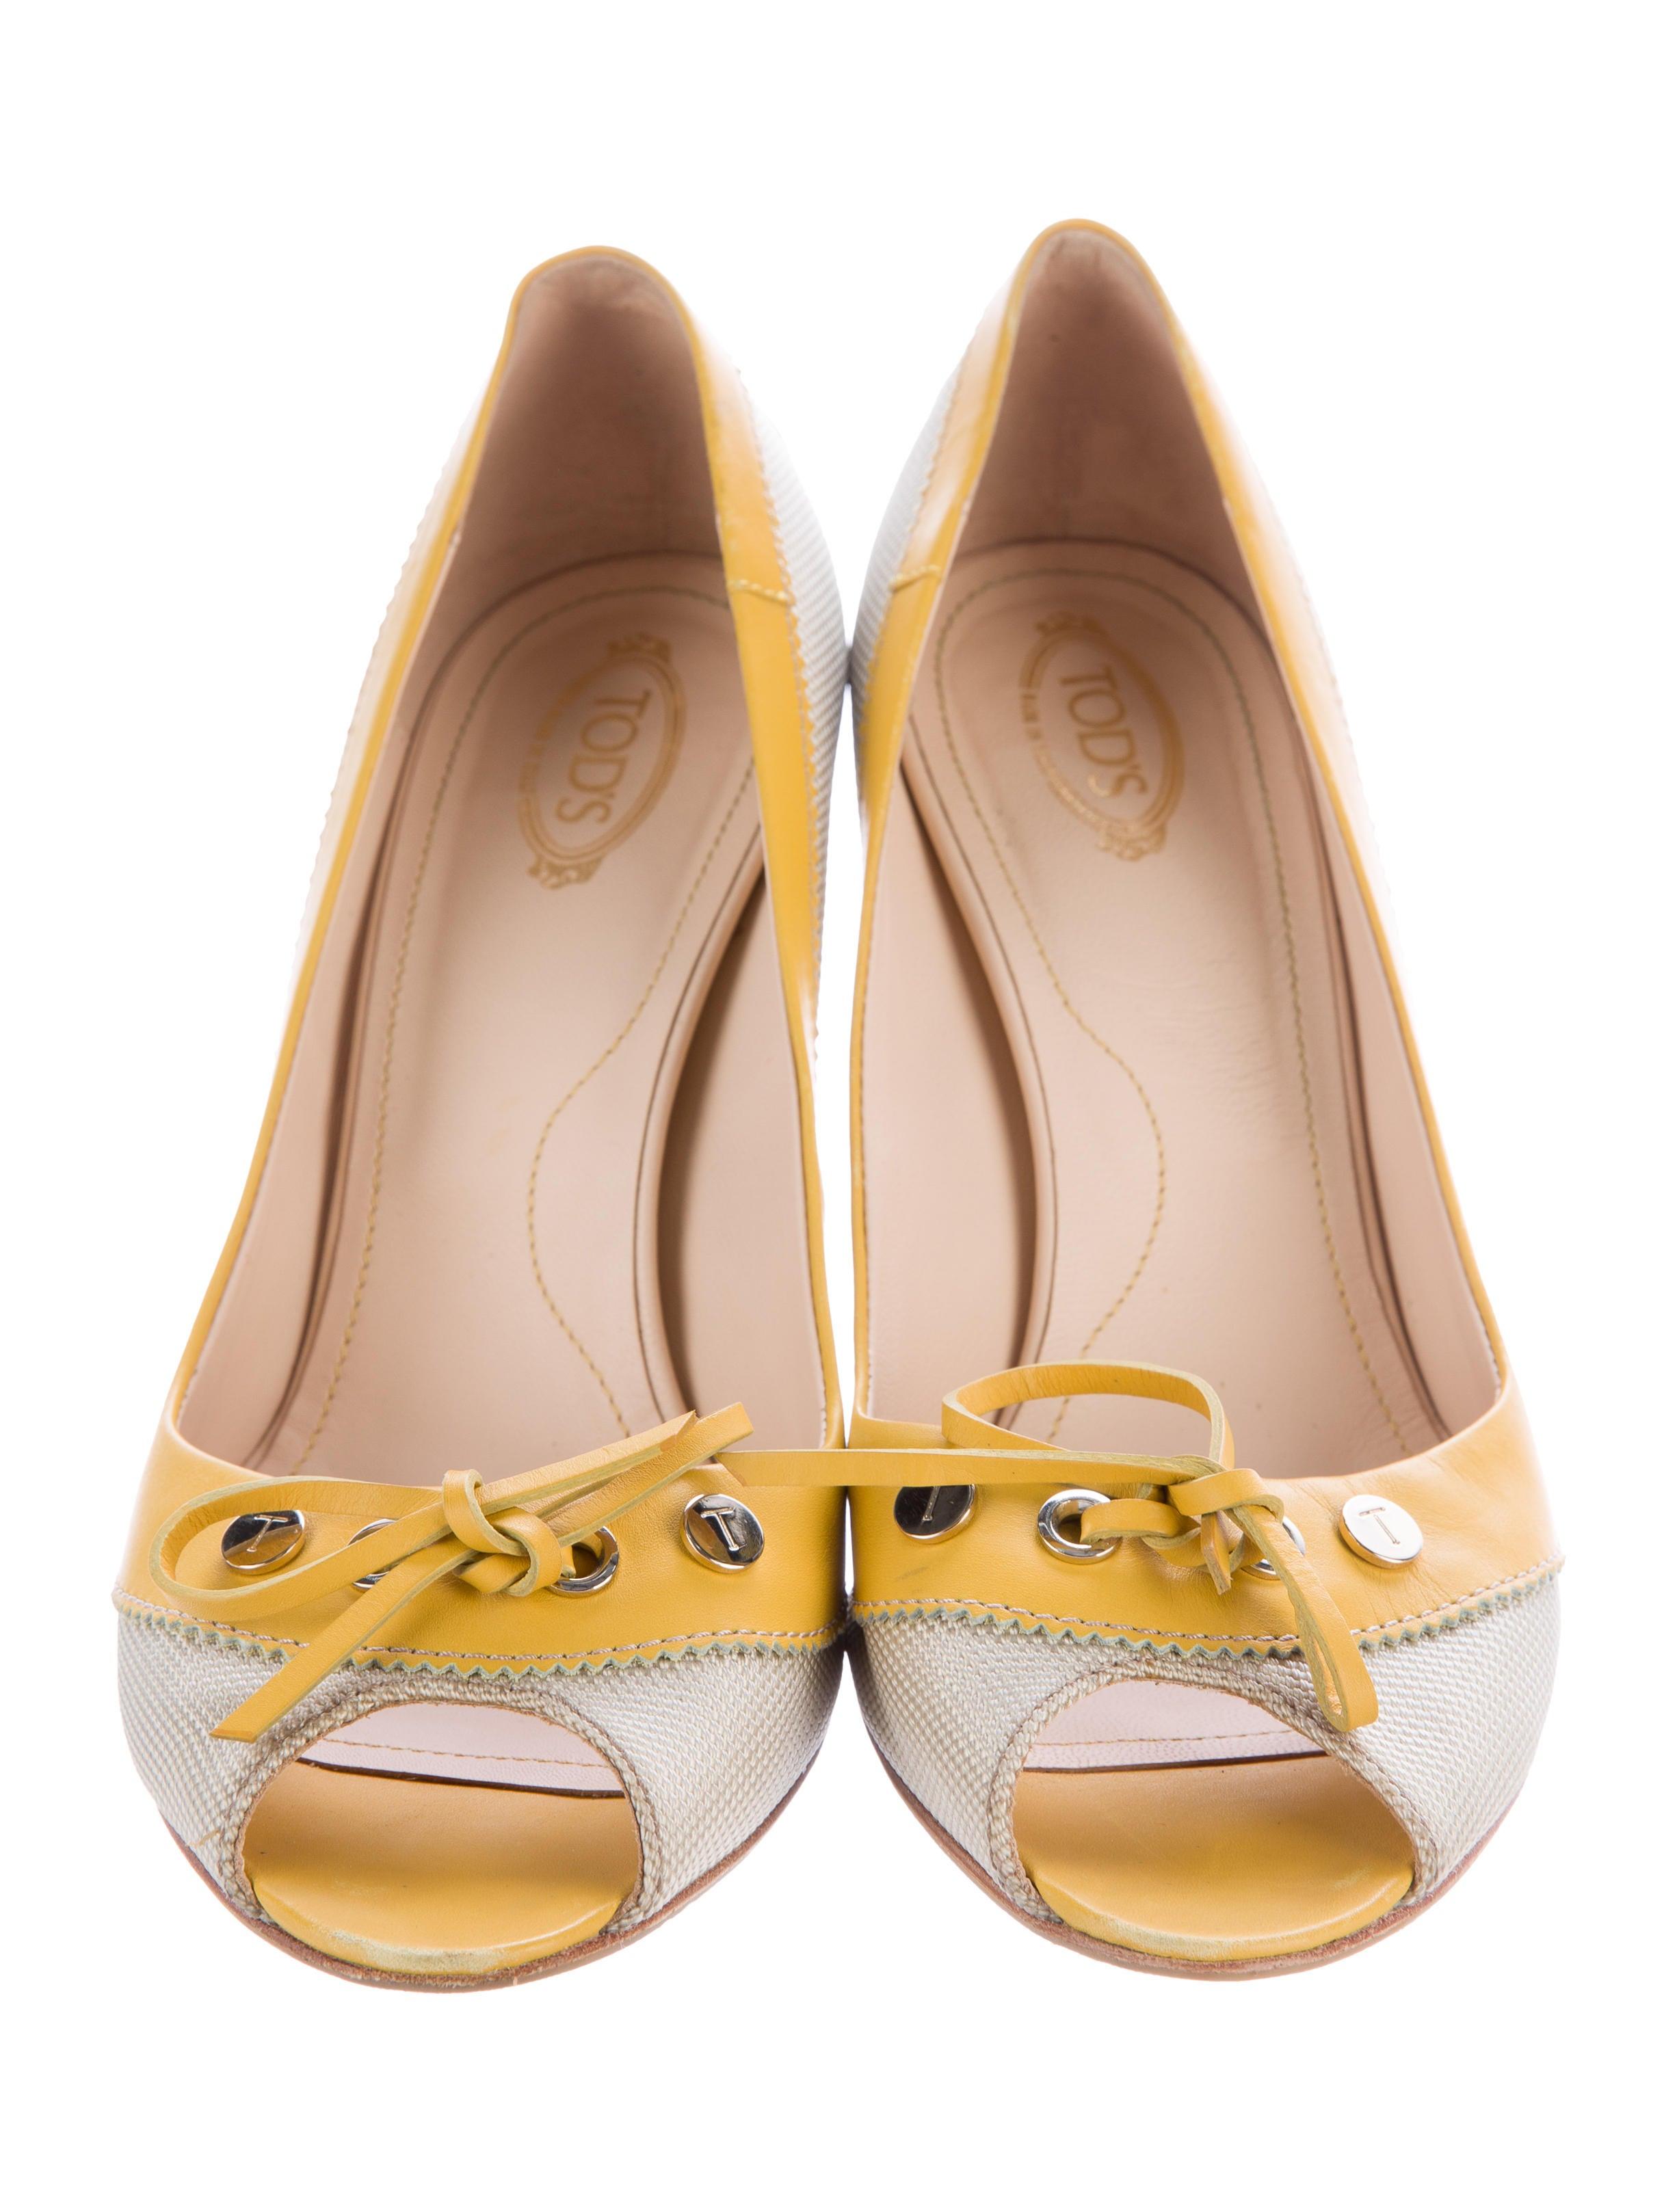 tod s canvas peep toe pumps shoes tod41017 the realreal